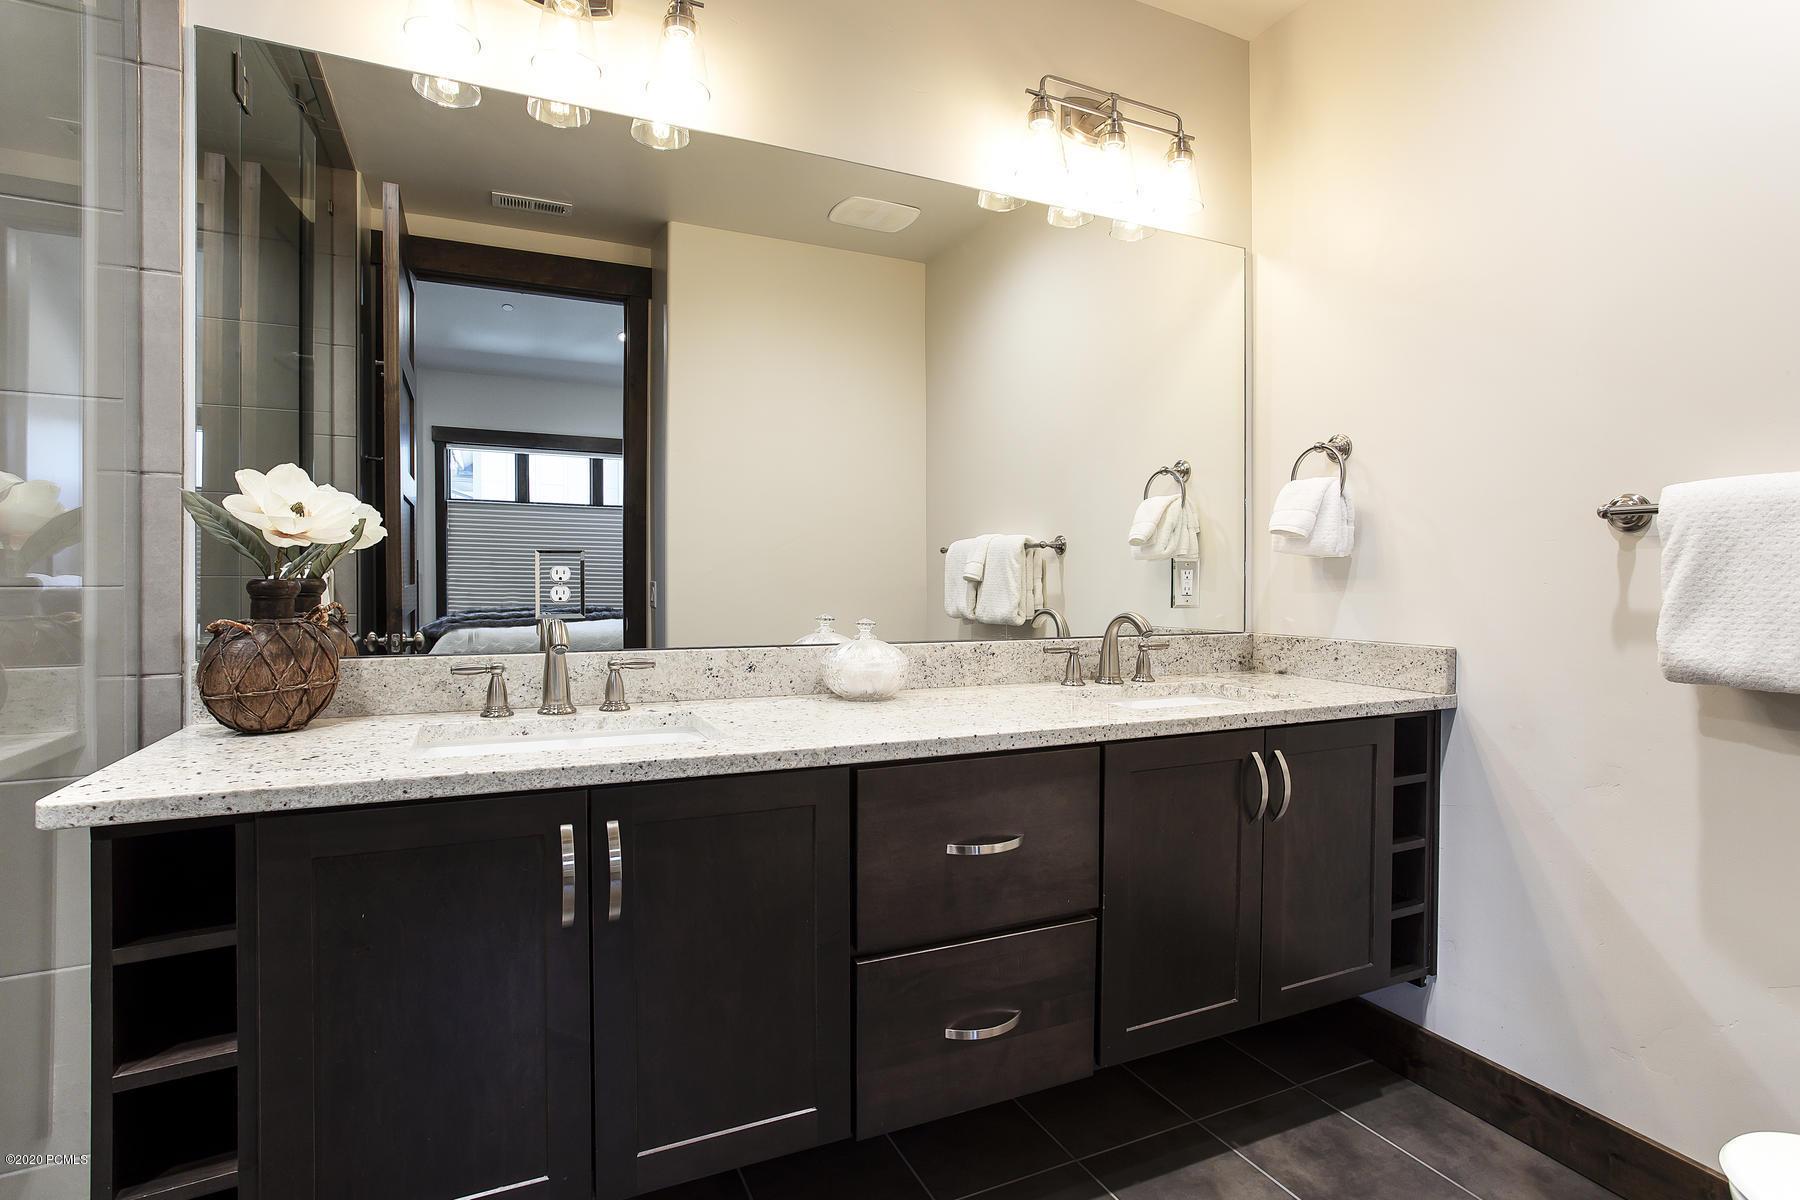 3793 Blackstone Drive, Park City, Utah 84098, 2 Bedrooms Bedrooms, ,3 BathroomsBathrooms,Condominium,For Sale,Blackstone,12001712